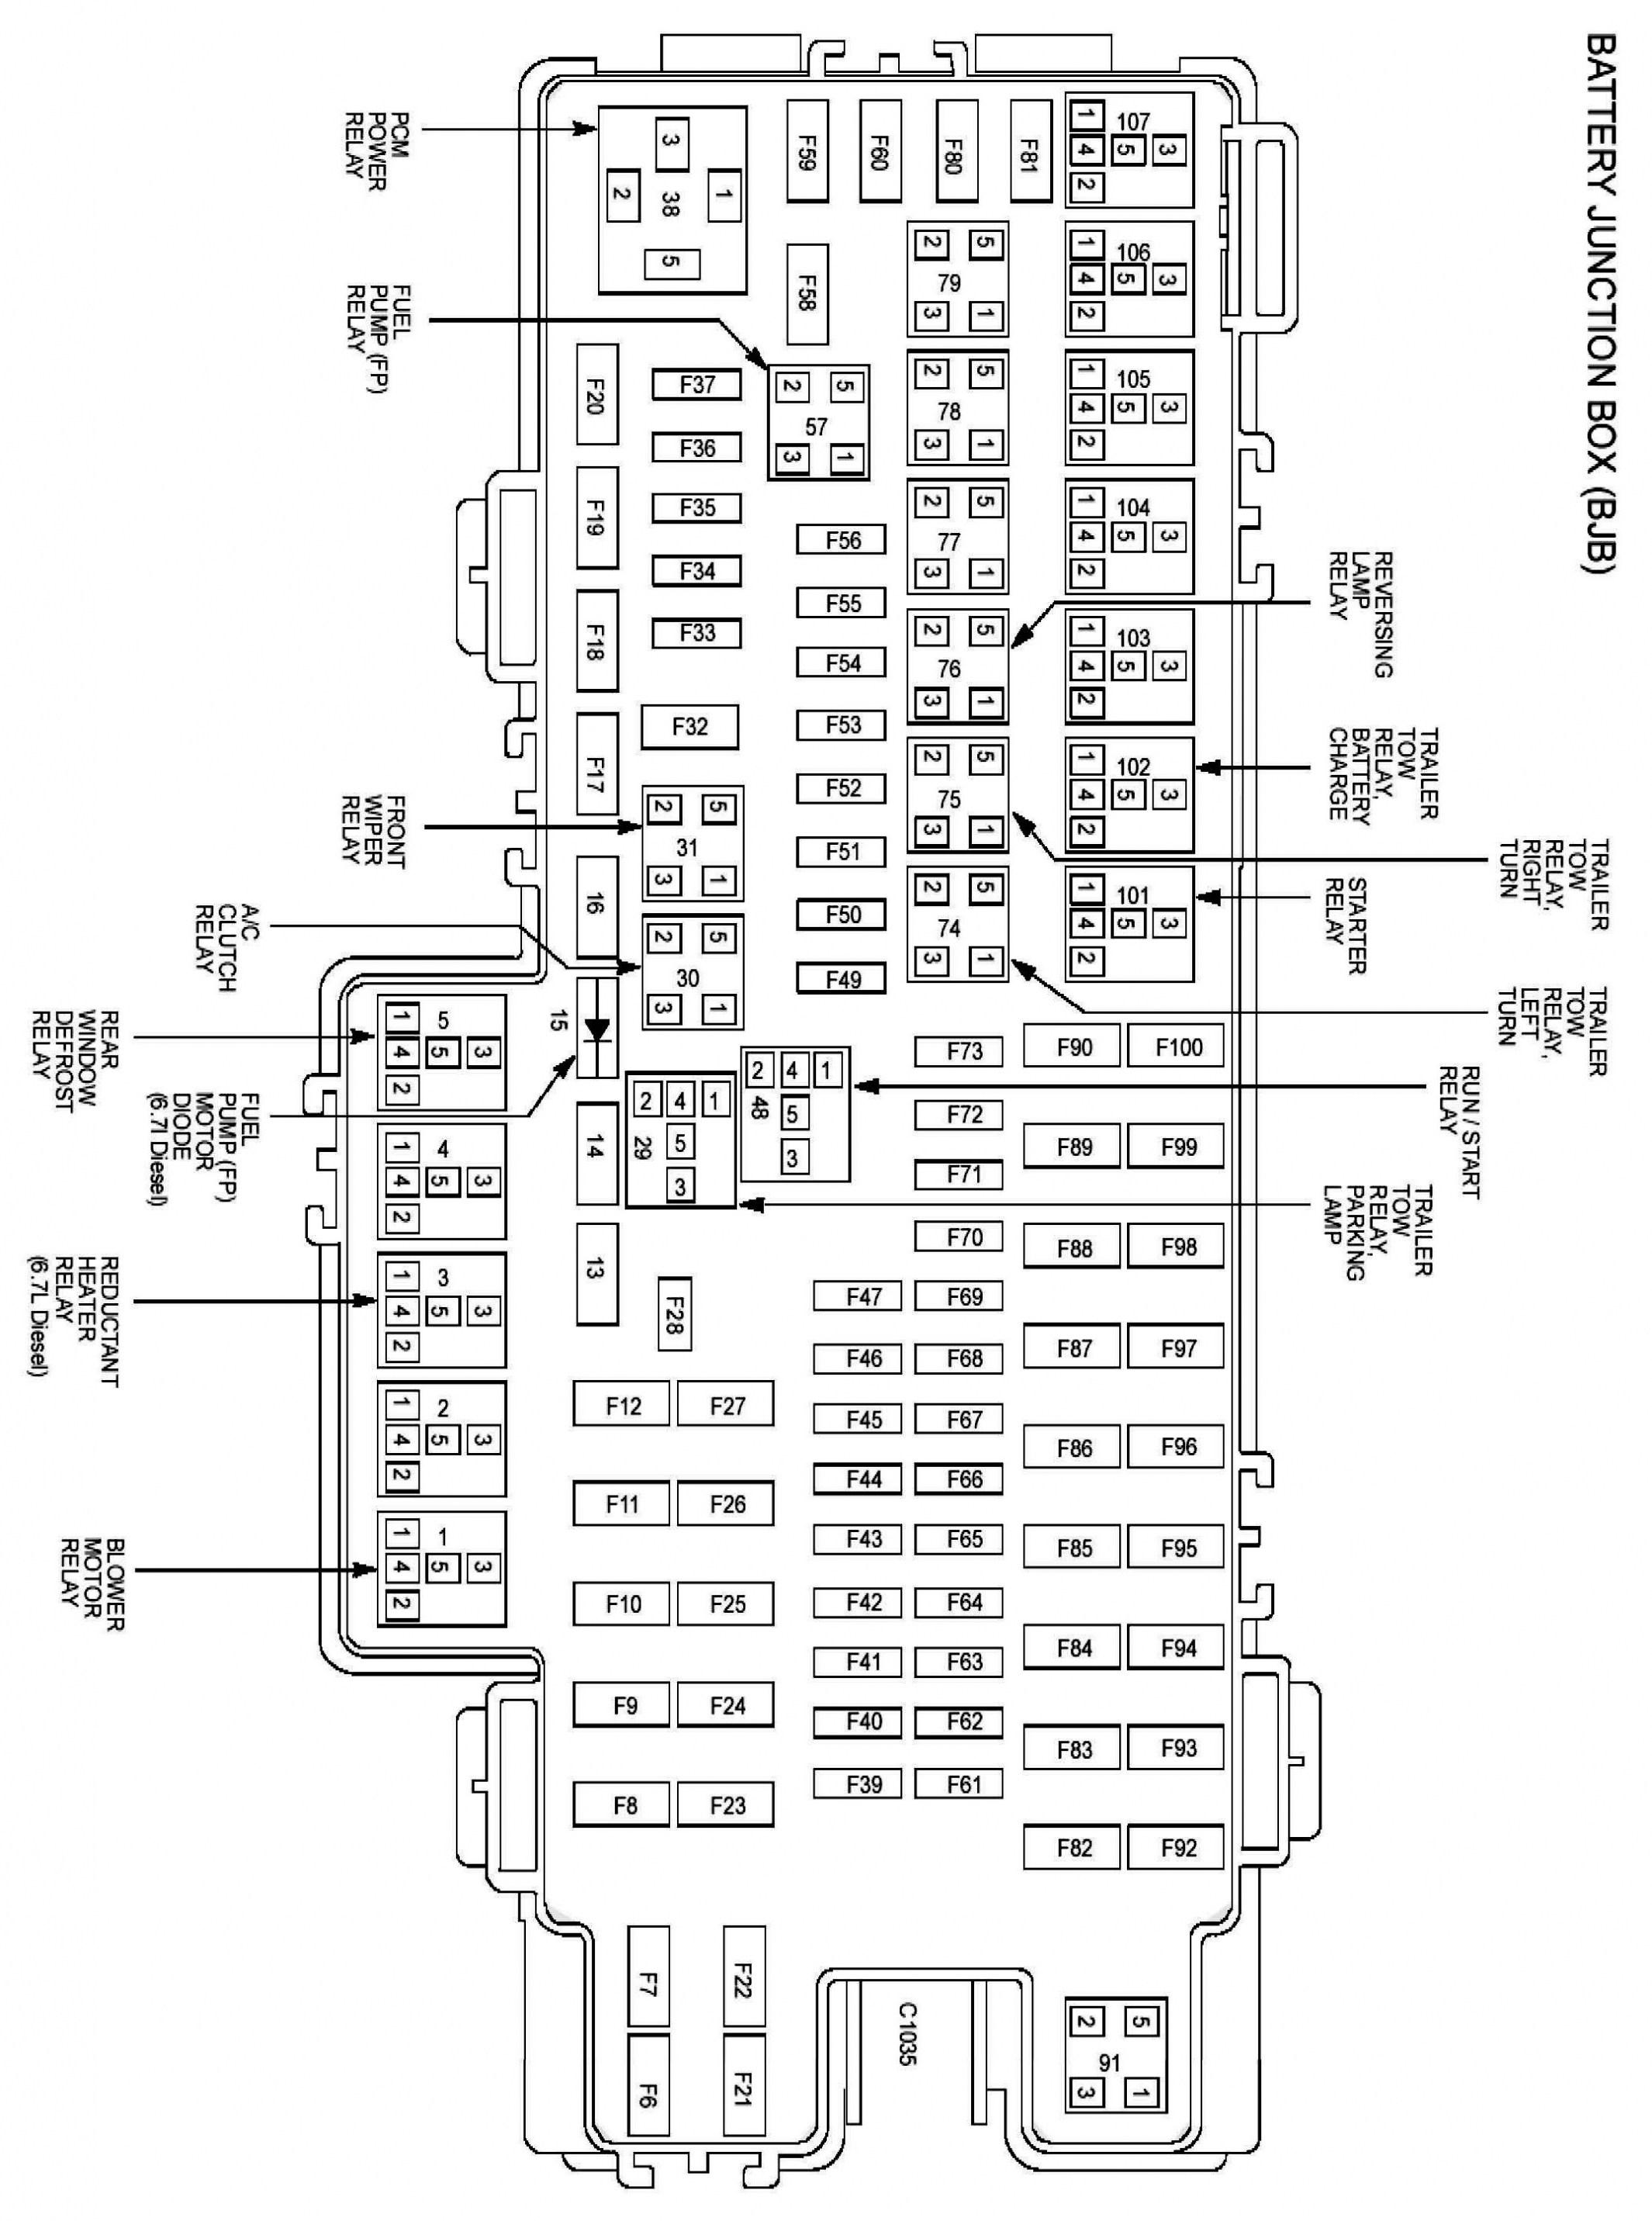 Phenomenal 2015 F 250 Fuse Diagram Wiring Diagram Wiring Cloud Icalpermsplehendilmohammedshrineorg